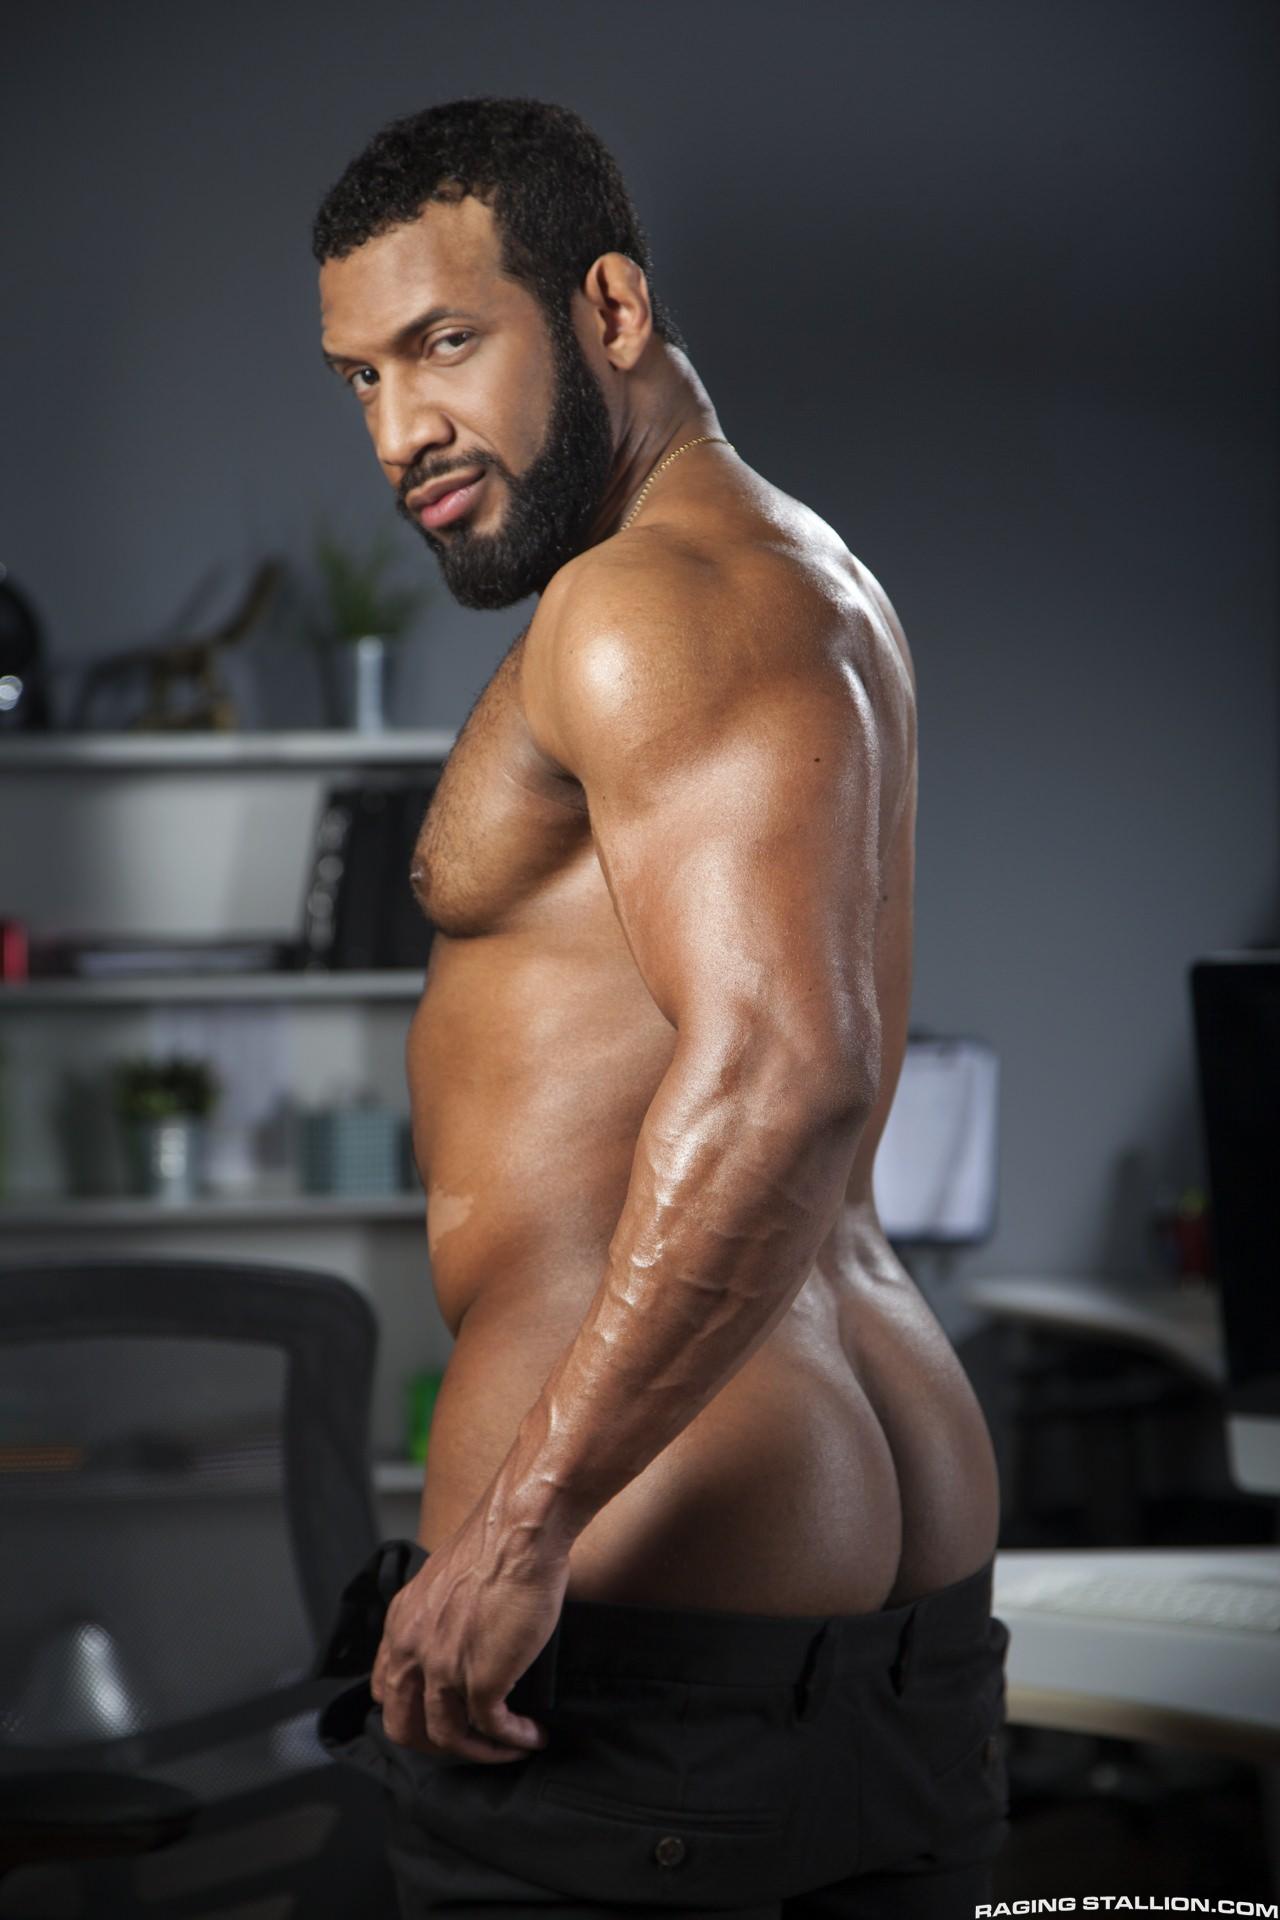 Black male pornstars search, titty fuck up on top gip